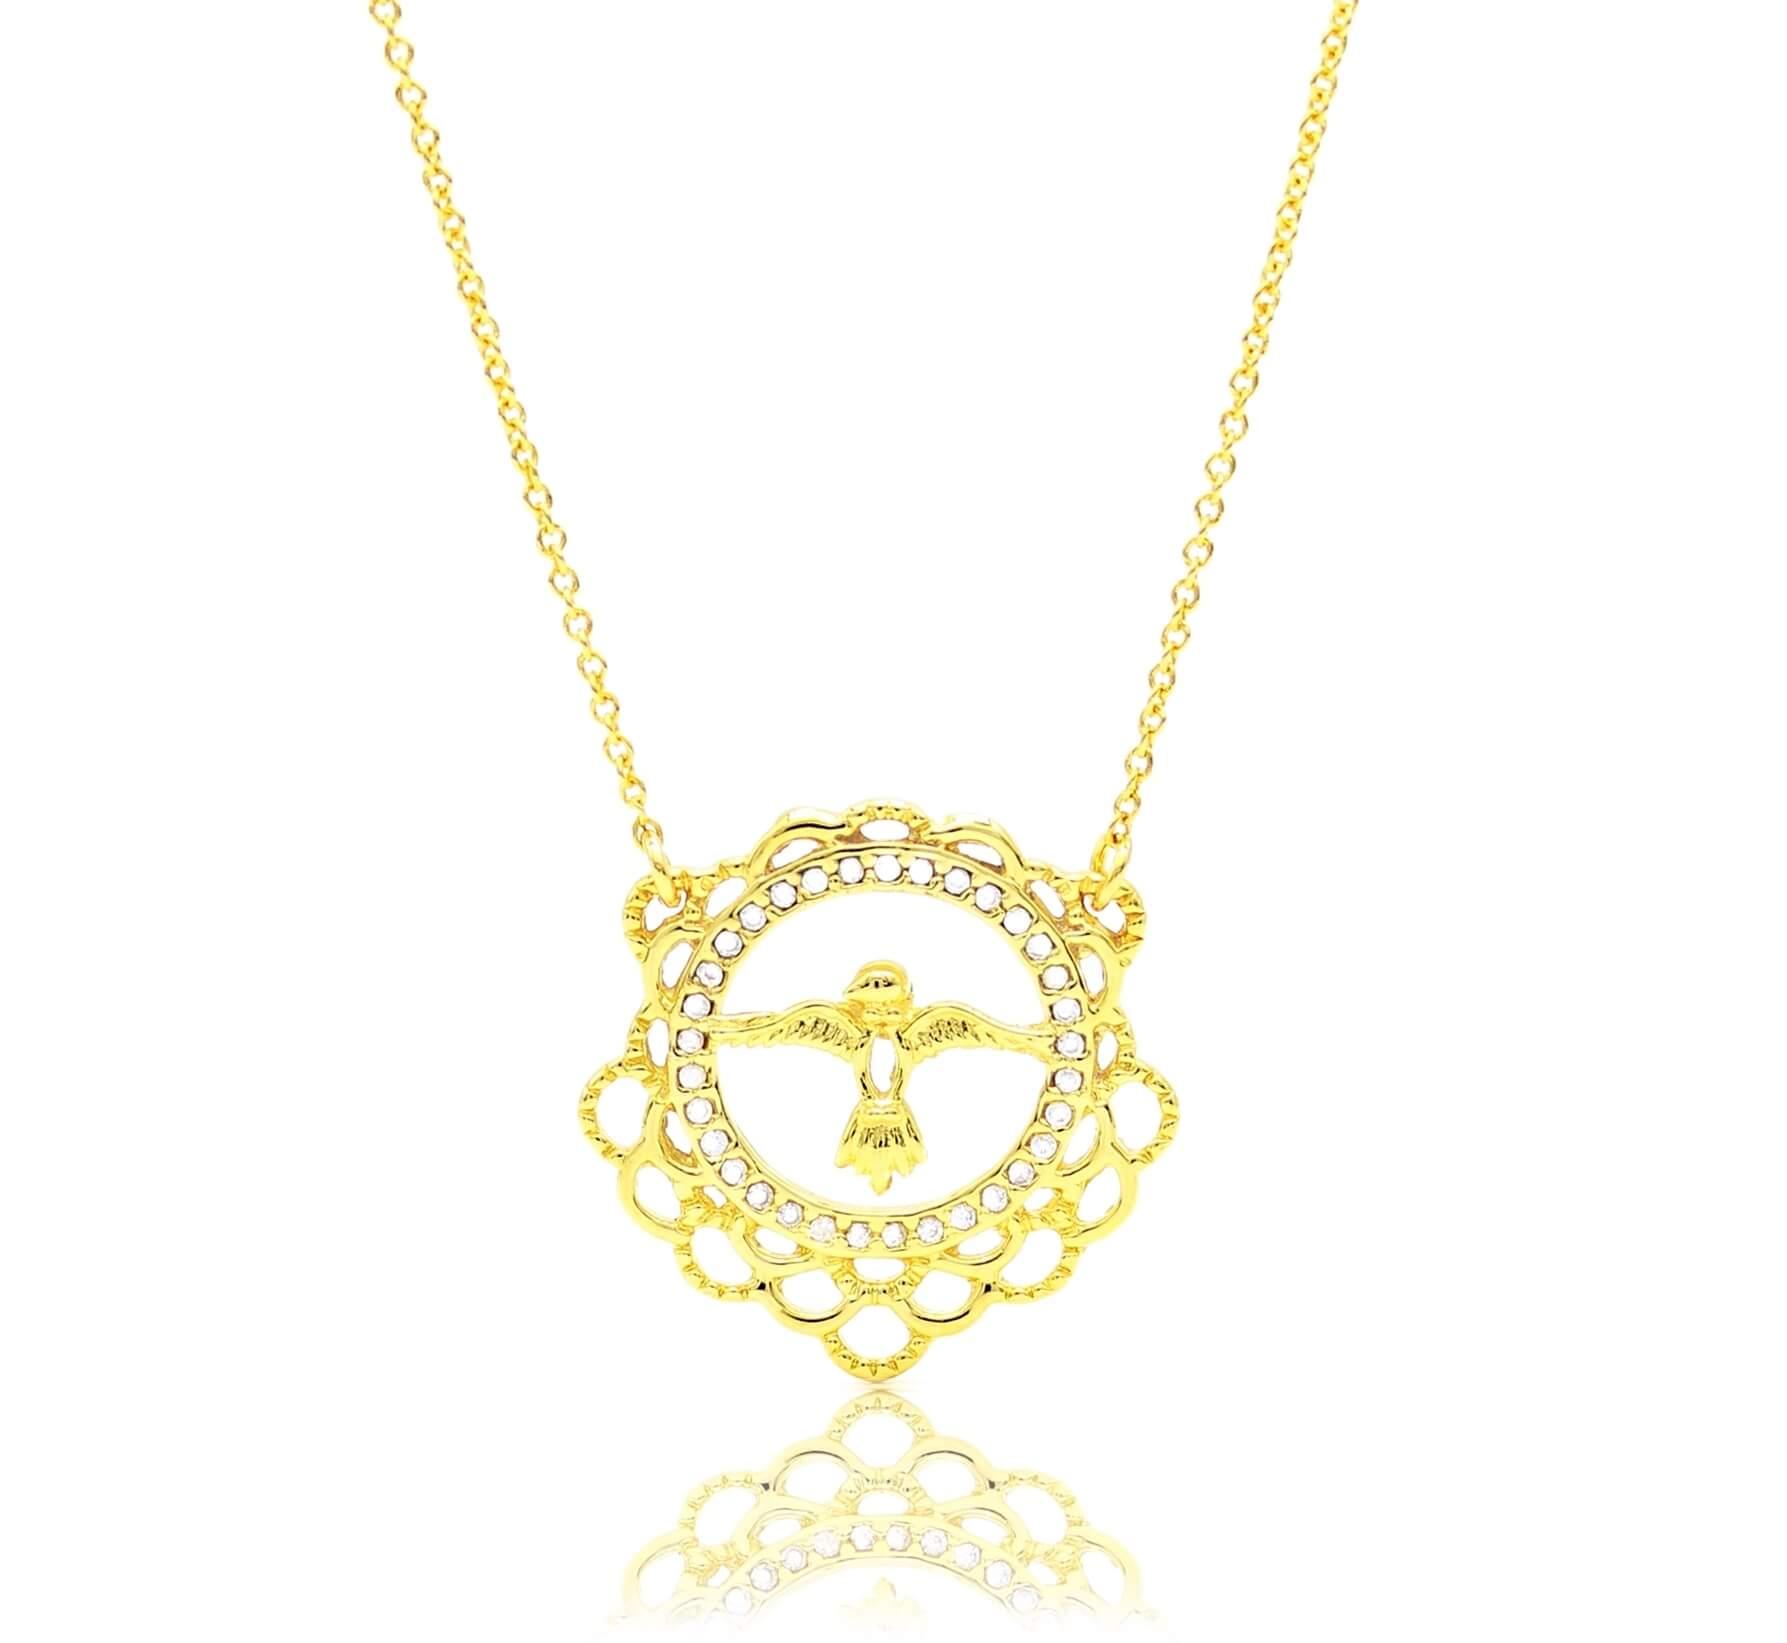 Corrente Espirito Santo Folhado a Ouro